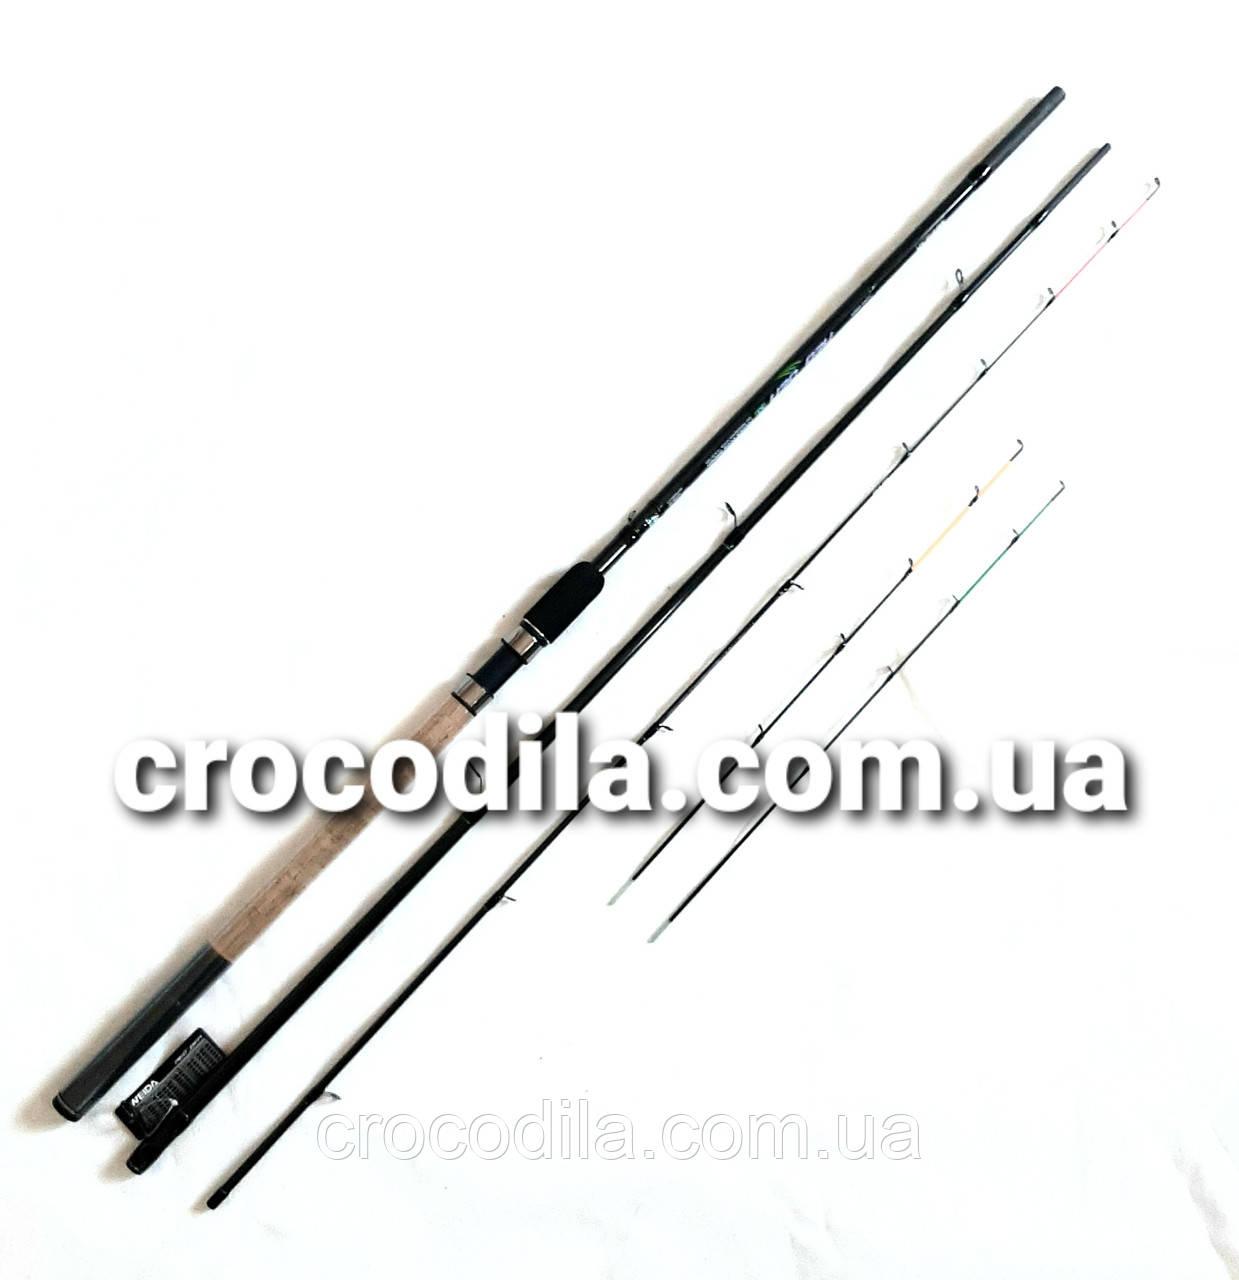 Фидерное удилище Kaida (Weida)  NeoXoen 2.7 m 60-120 грамм